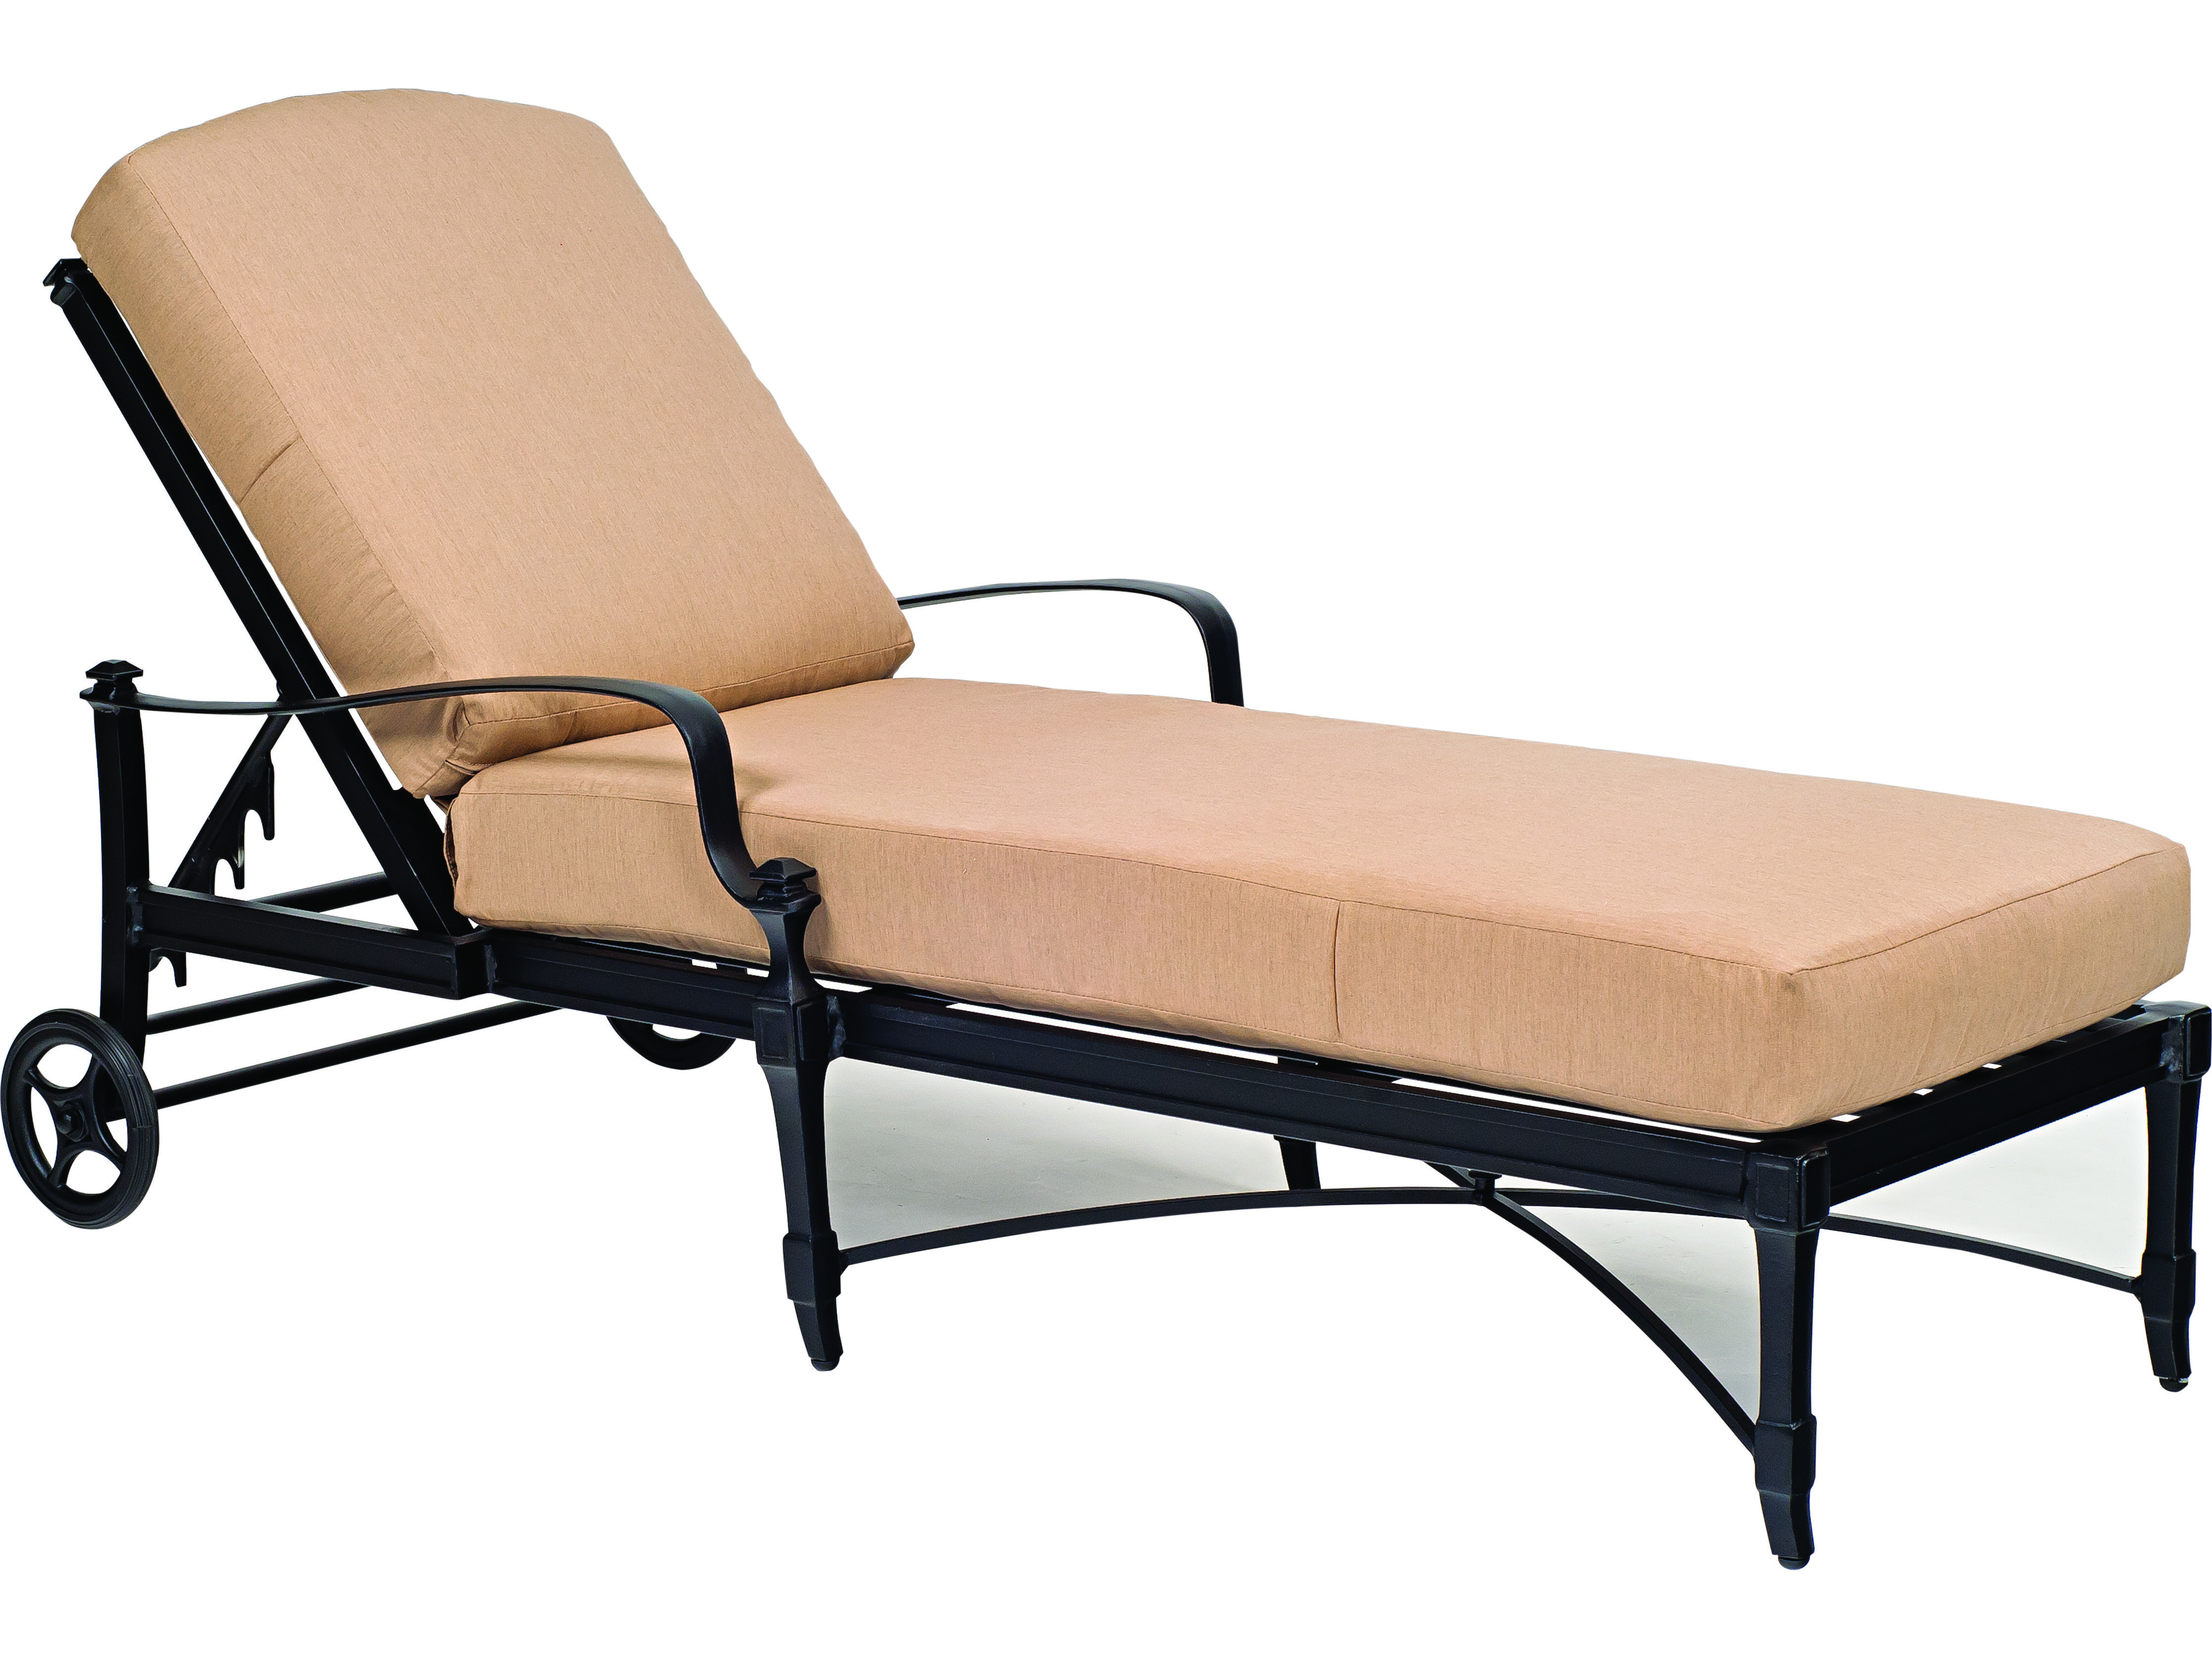 Woodard Isla Cast Aluminum Chaise Lounge